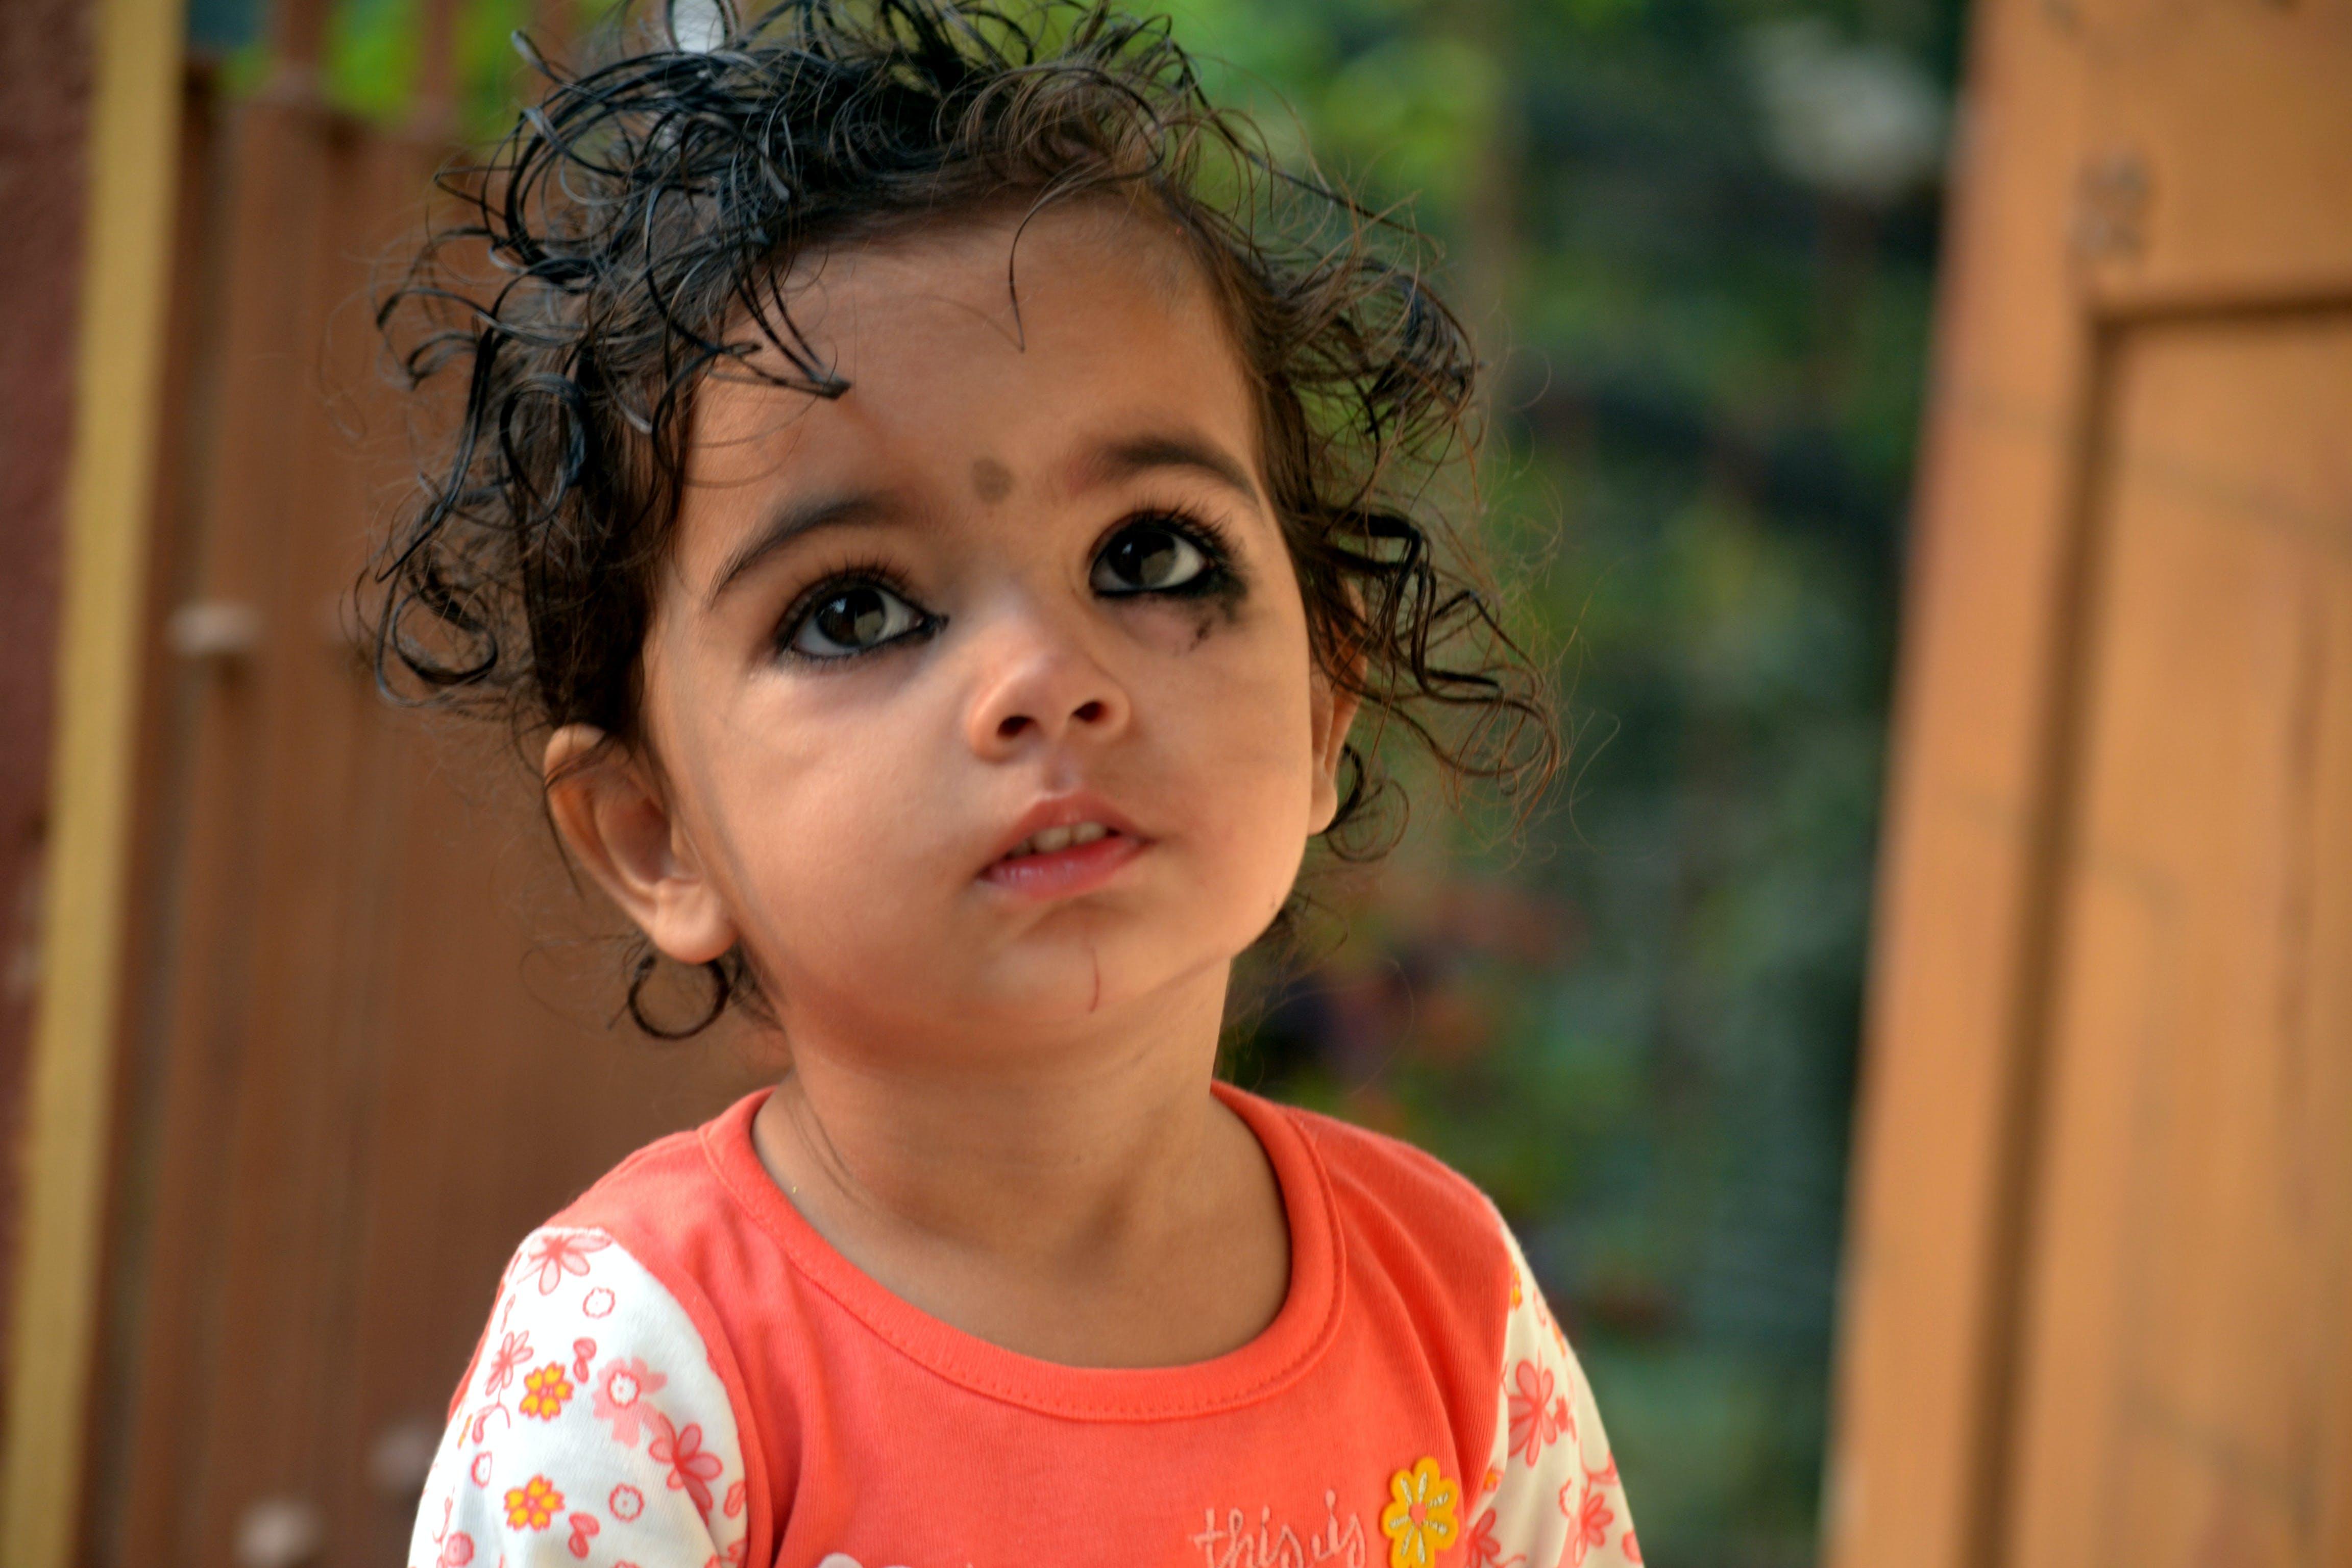 Free stock photo of Adobe Photoshop, baby, child, cute girl